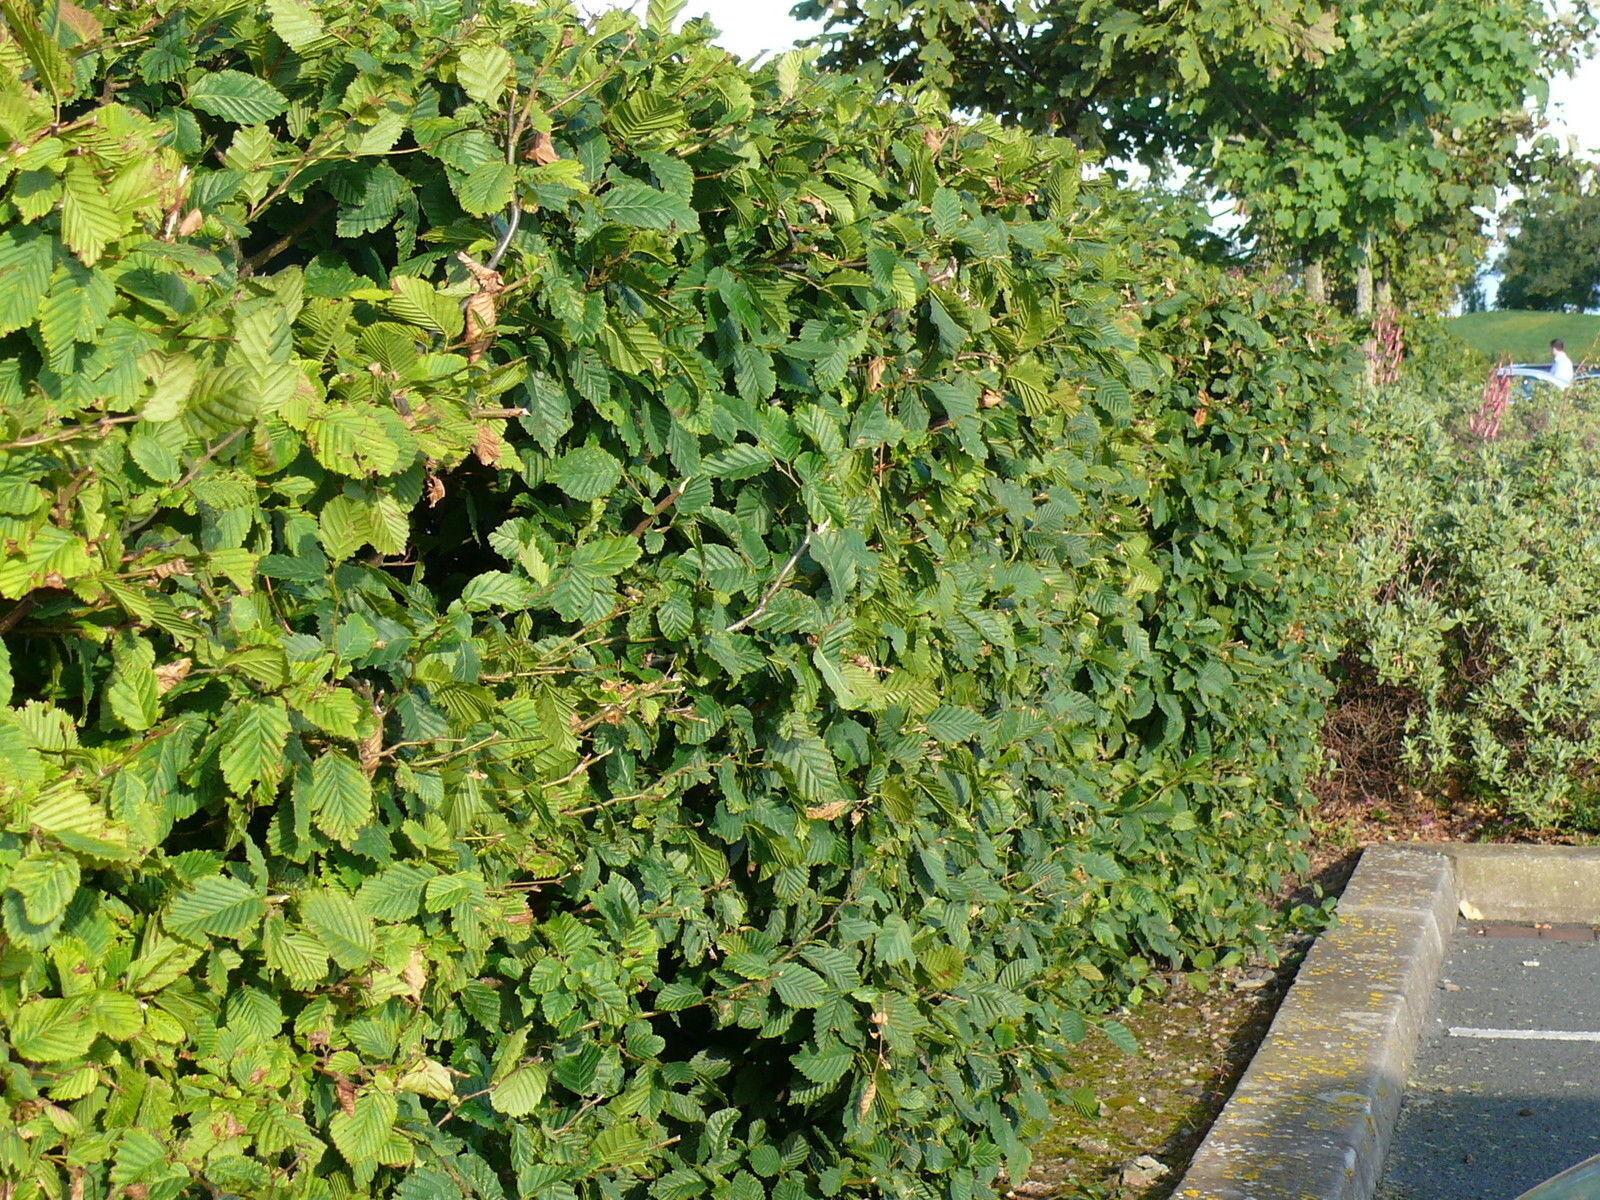 10 Hornbeam//Carpinus Betulus Plants 4-5ft Tall Bare-Rooted 3fatpigs/®